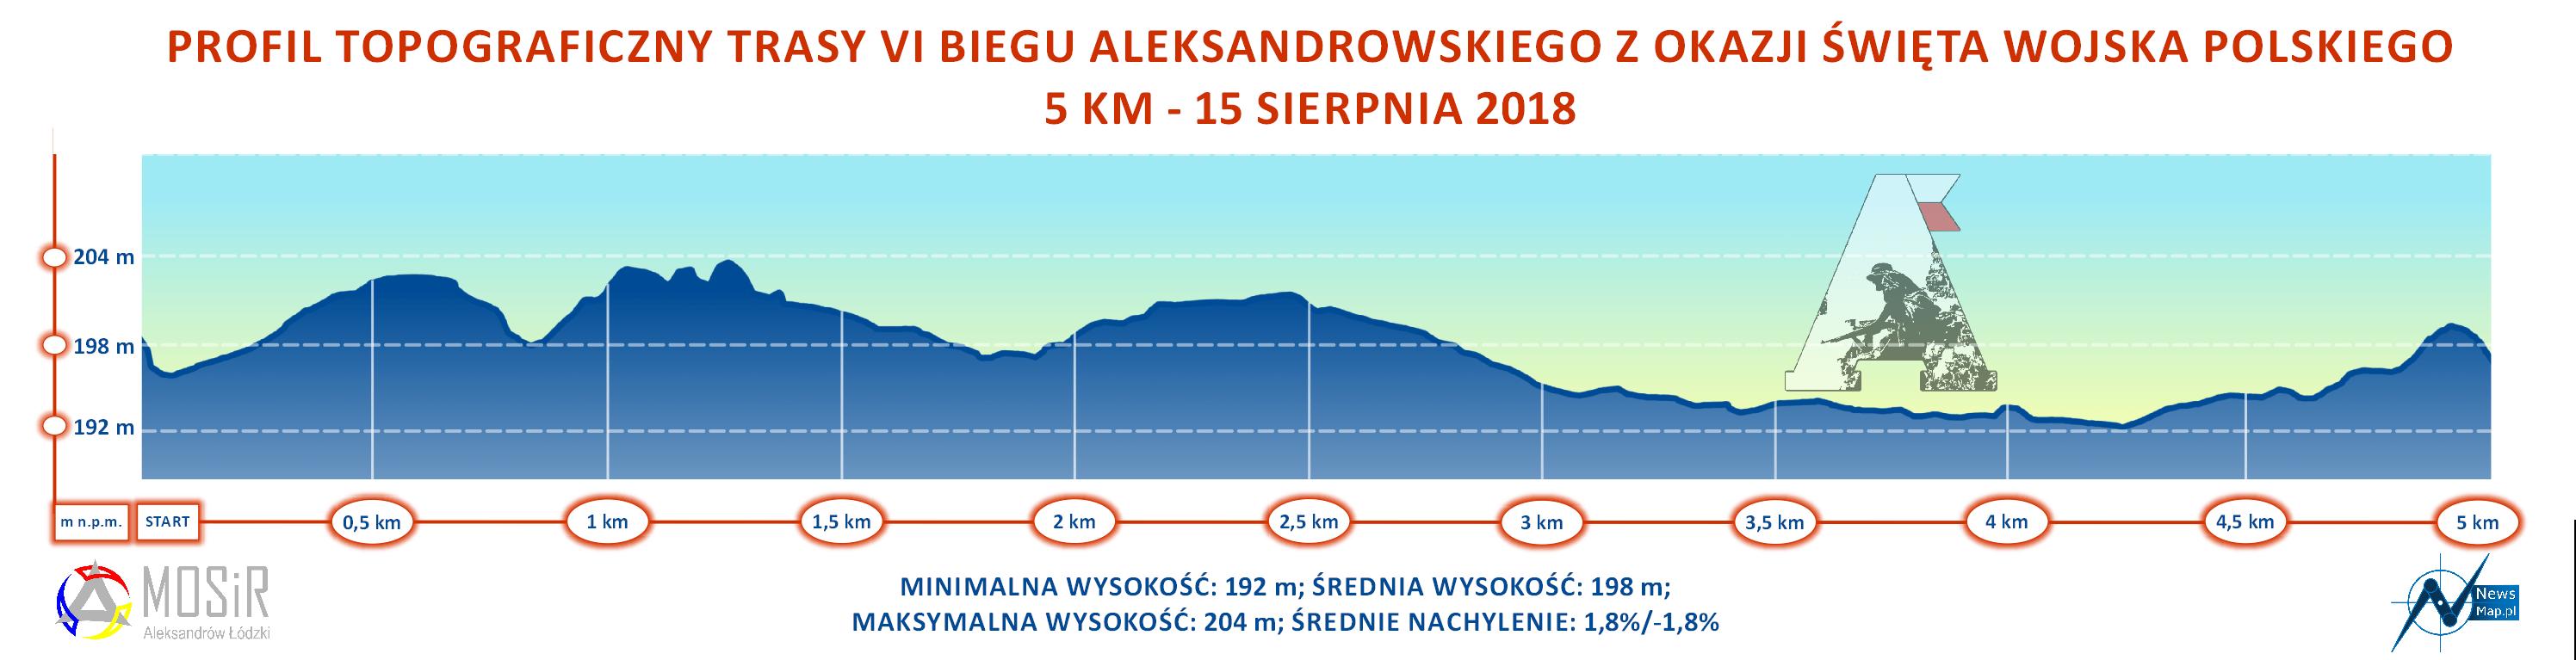 VI Półmaraton Aleksandrowski - profil topograficzny 5 KM